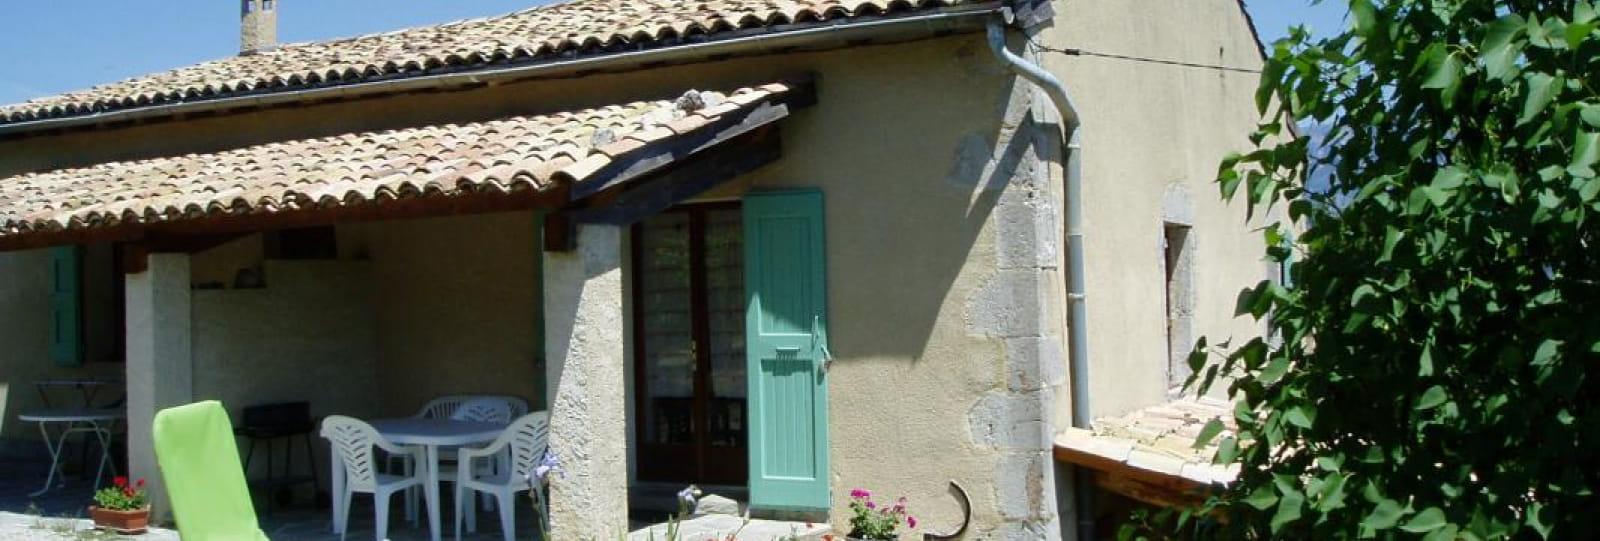 Terrasse plein sud gîte La Pousterle